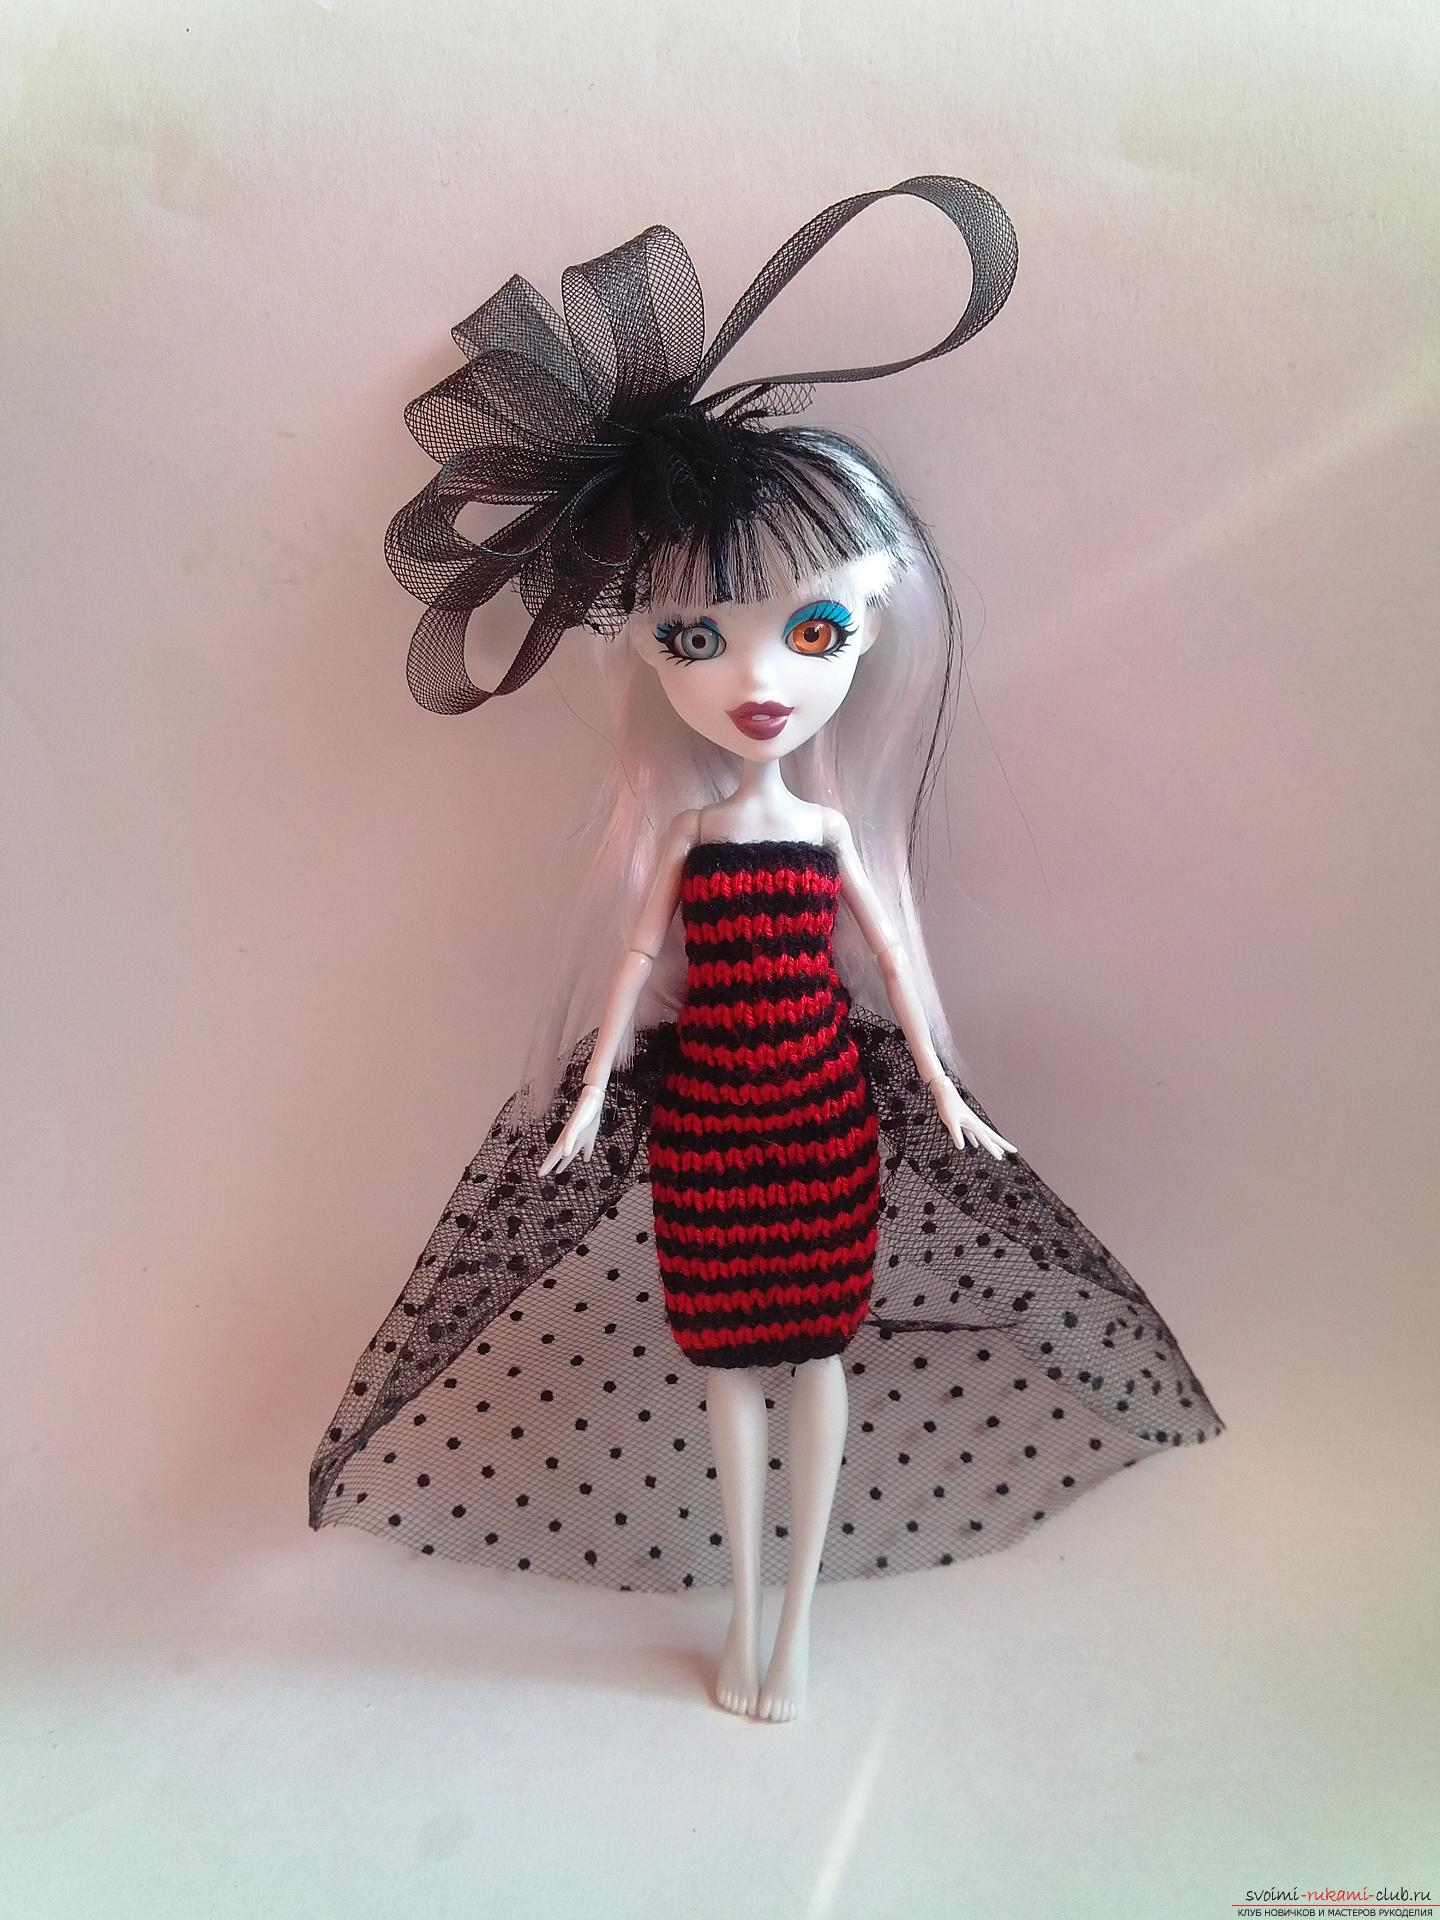 Как сделать платье на куклу монстер хай 841